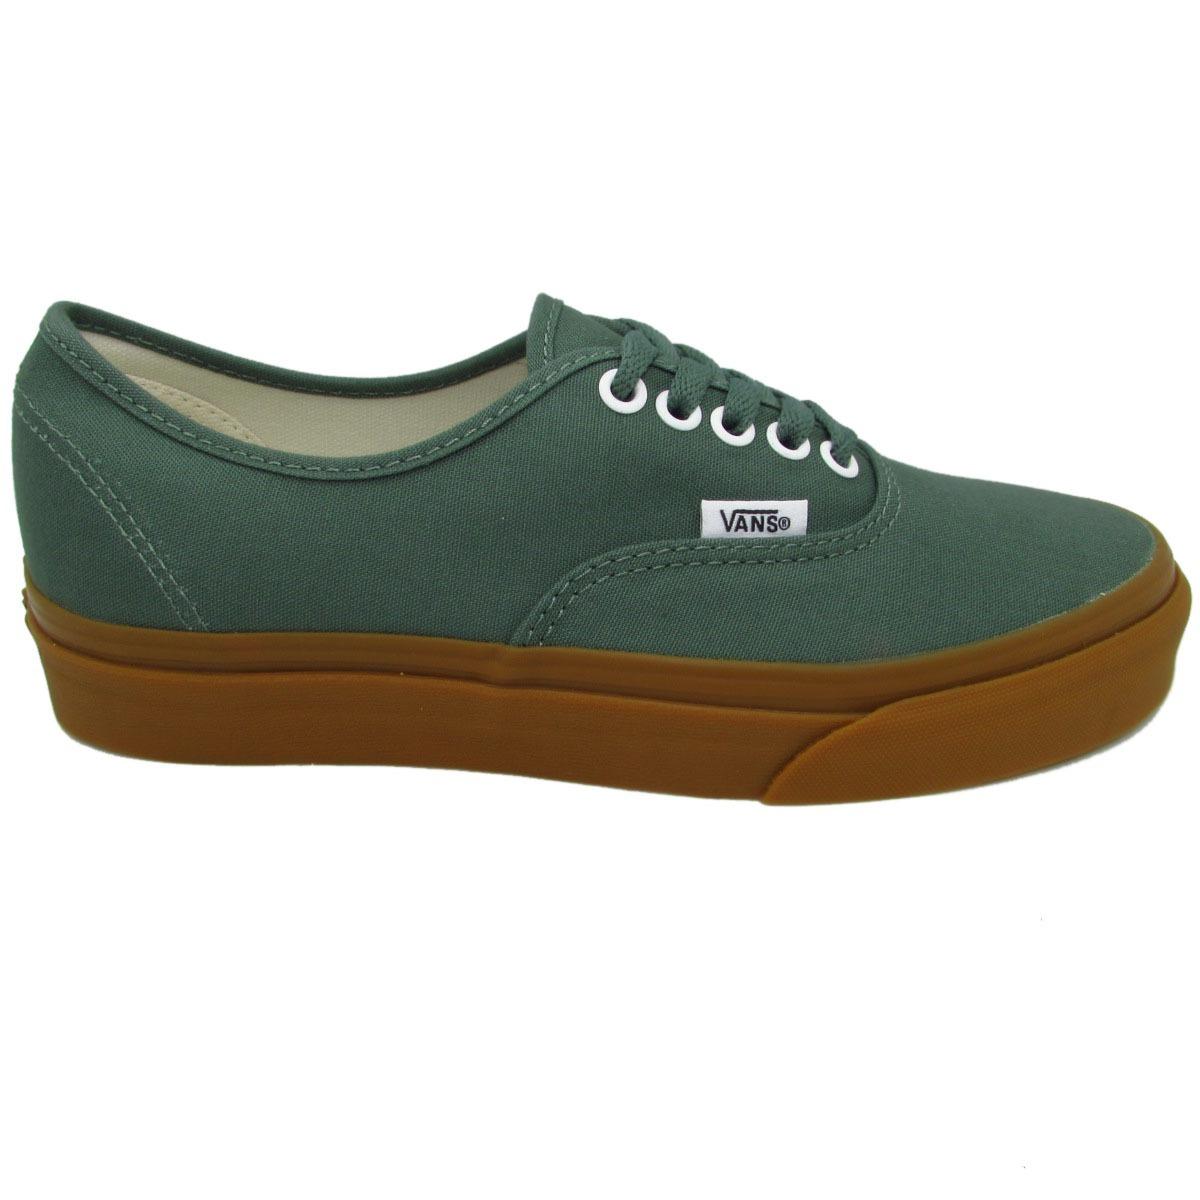 eafcb449d4f4 Tenis vans authentic a emq duck green gum verde liga jpg 1200x1200 Green gum